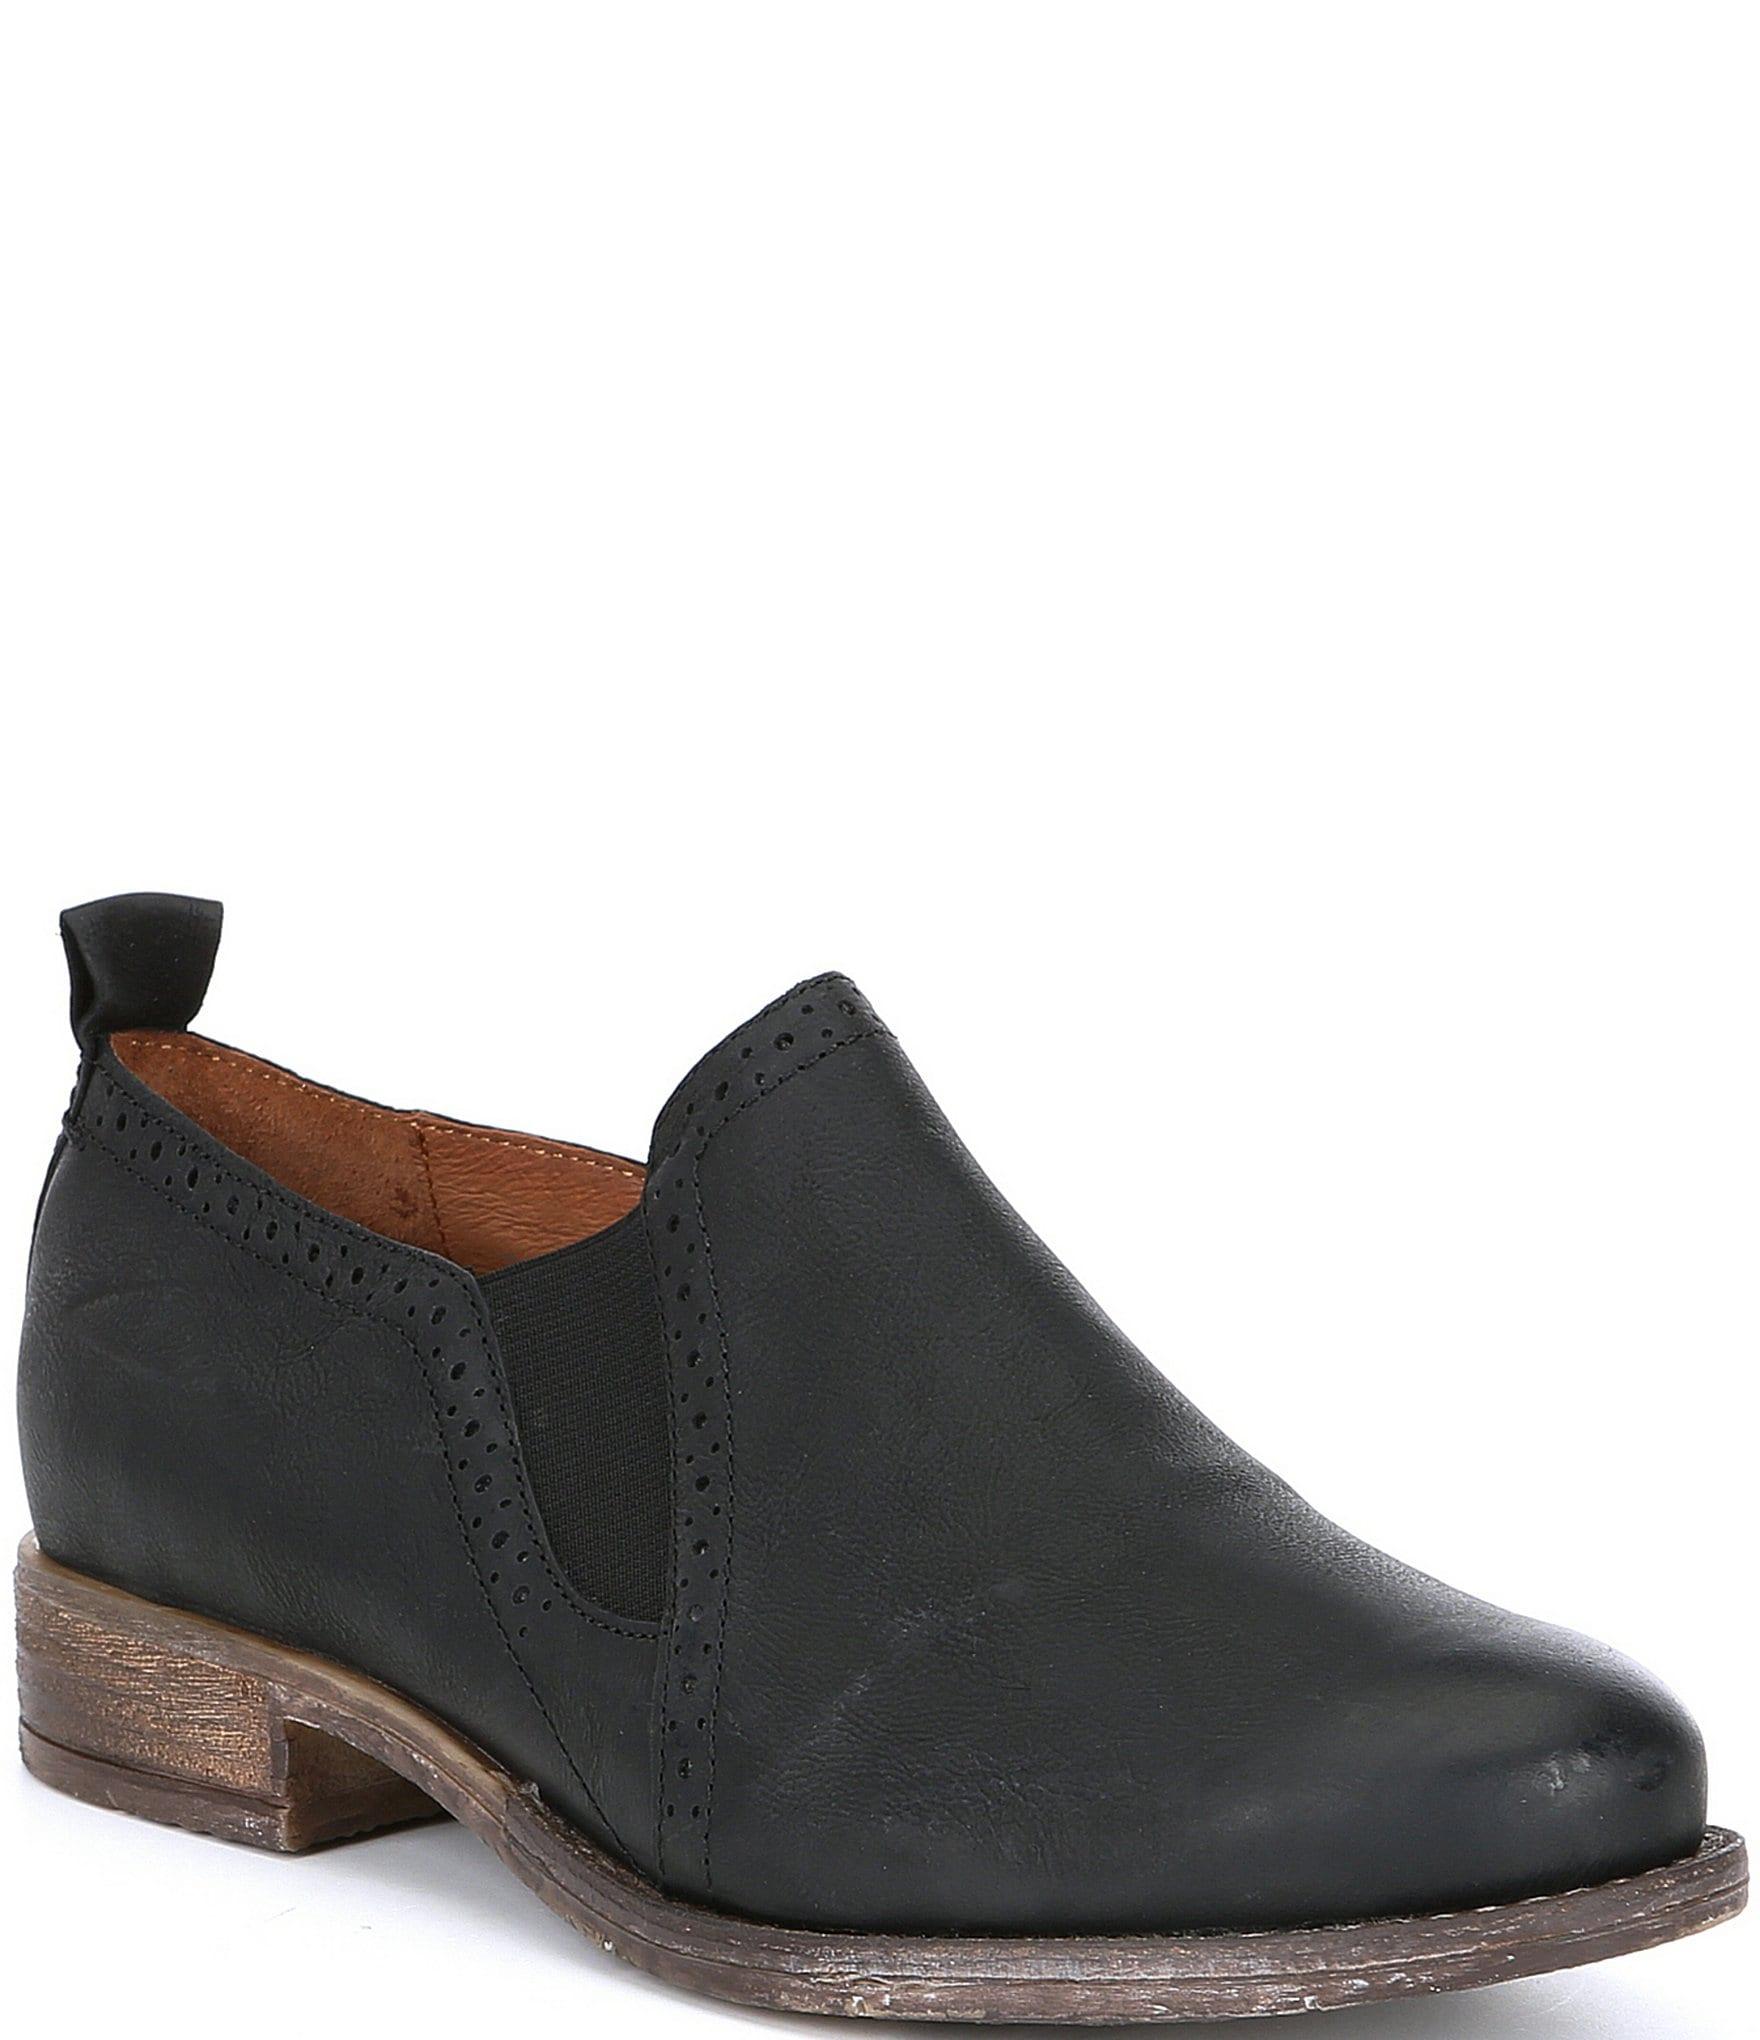 quality design 8d1df 6cf96 Josef Seibel Sienna 91 Slip On Leather Block Heel Loafers